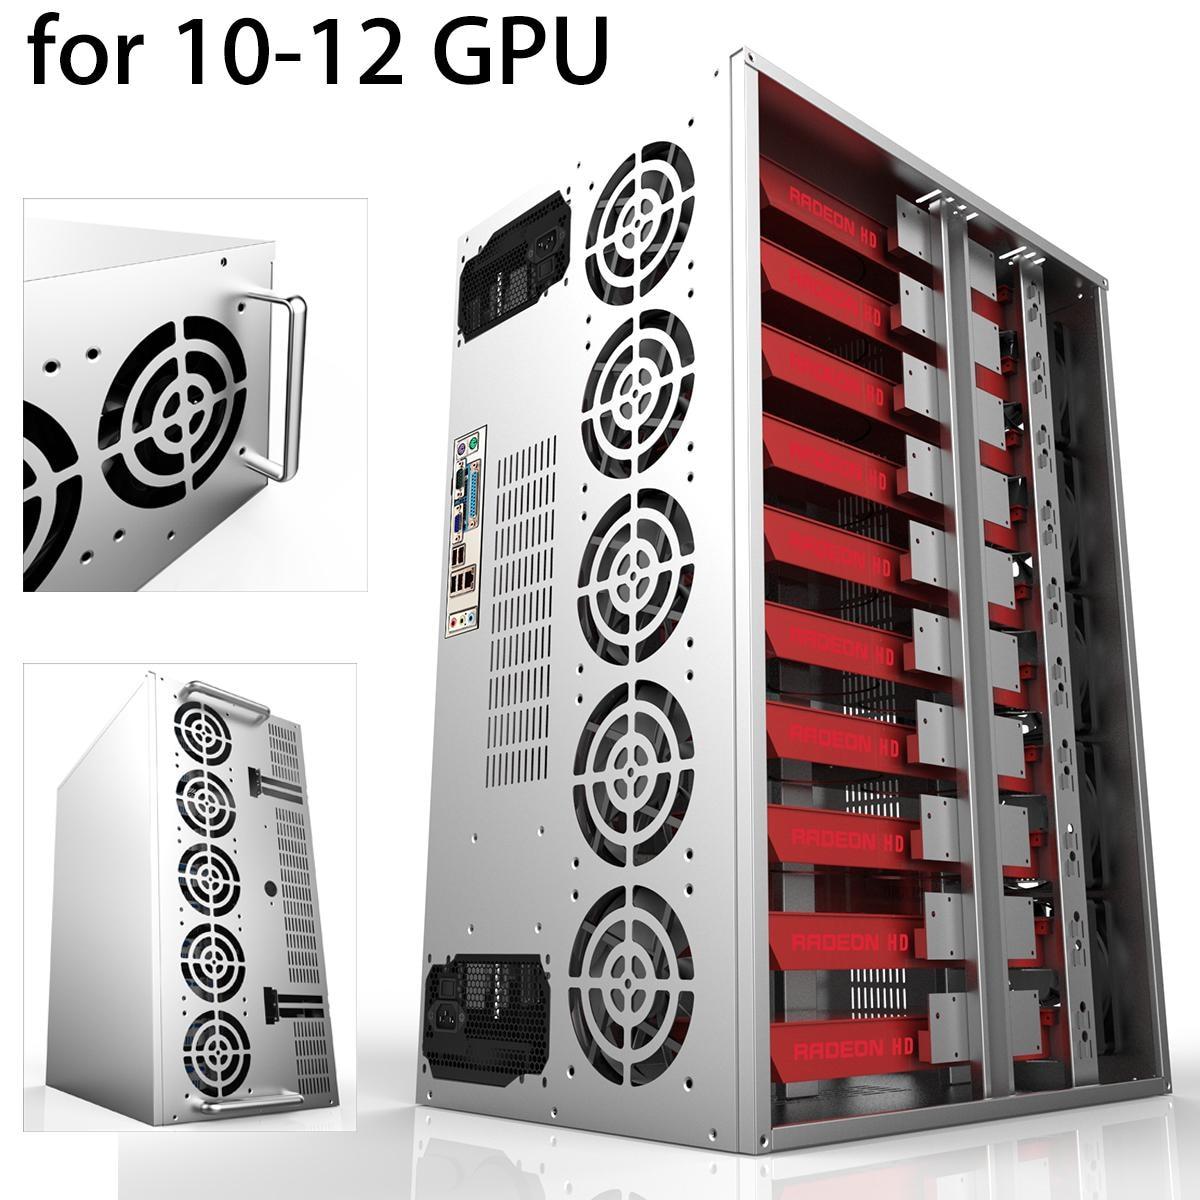 Efficiency 1600W Modular PC Power Supply 10 12 GPU 12V 24PIN 8PIN For Miner Mining High